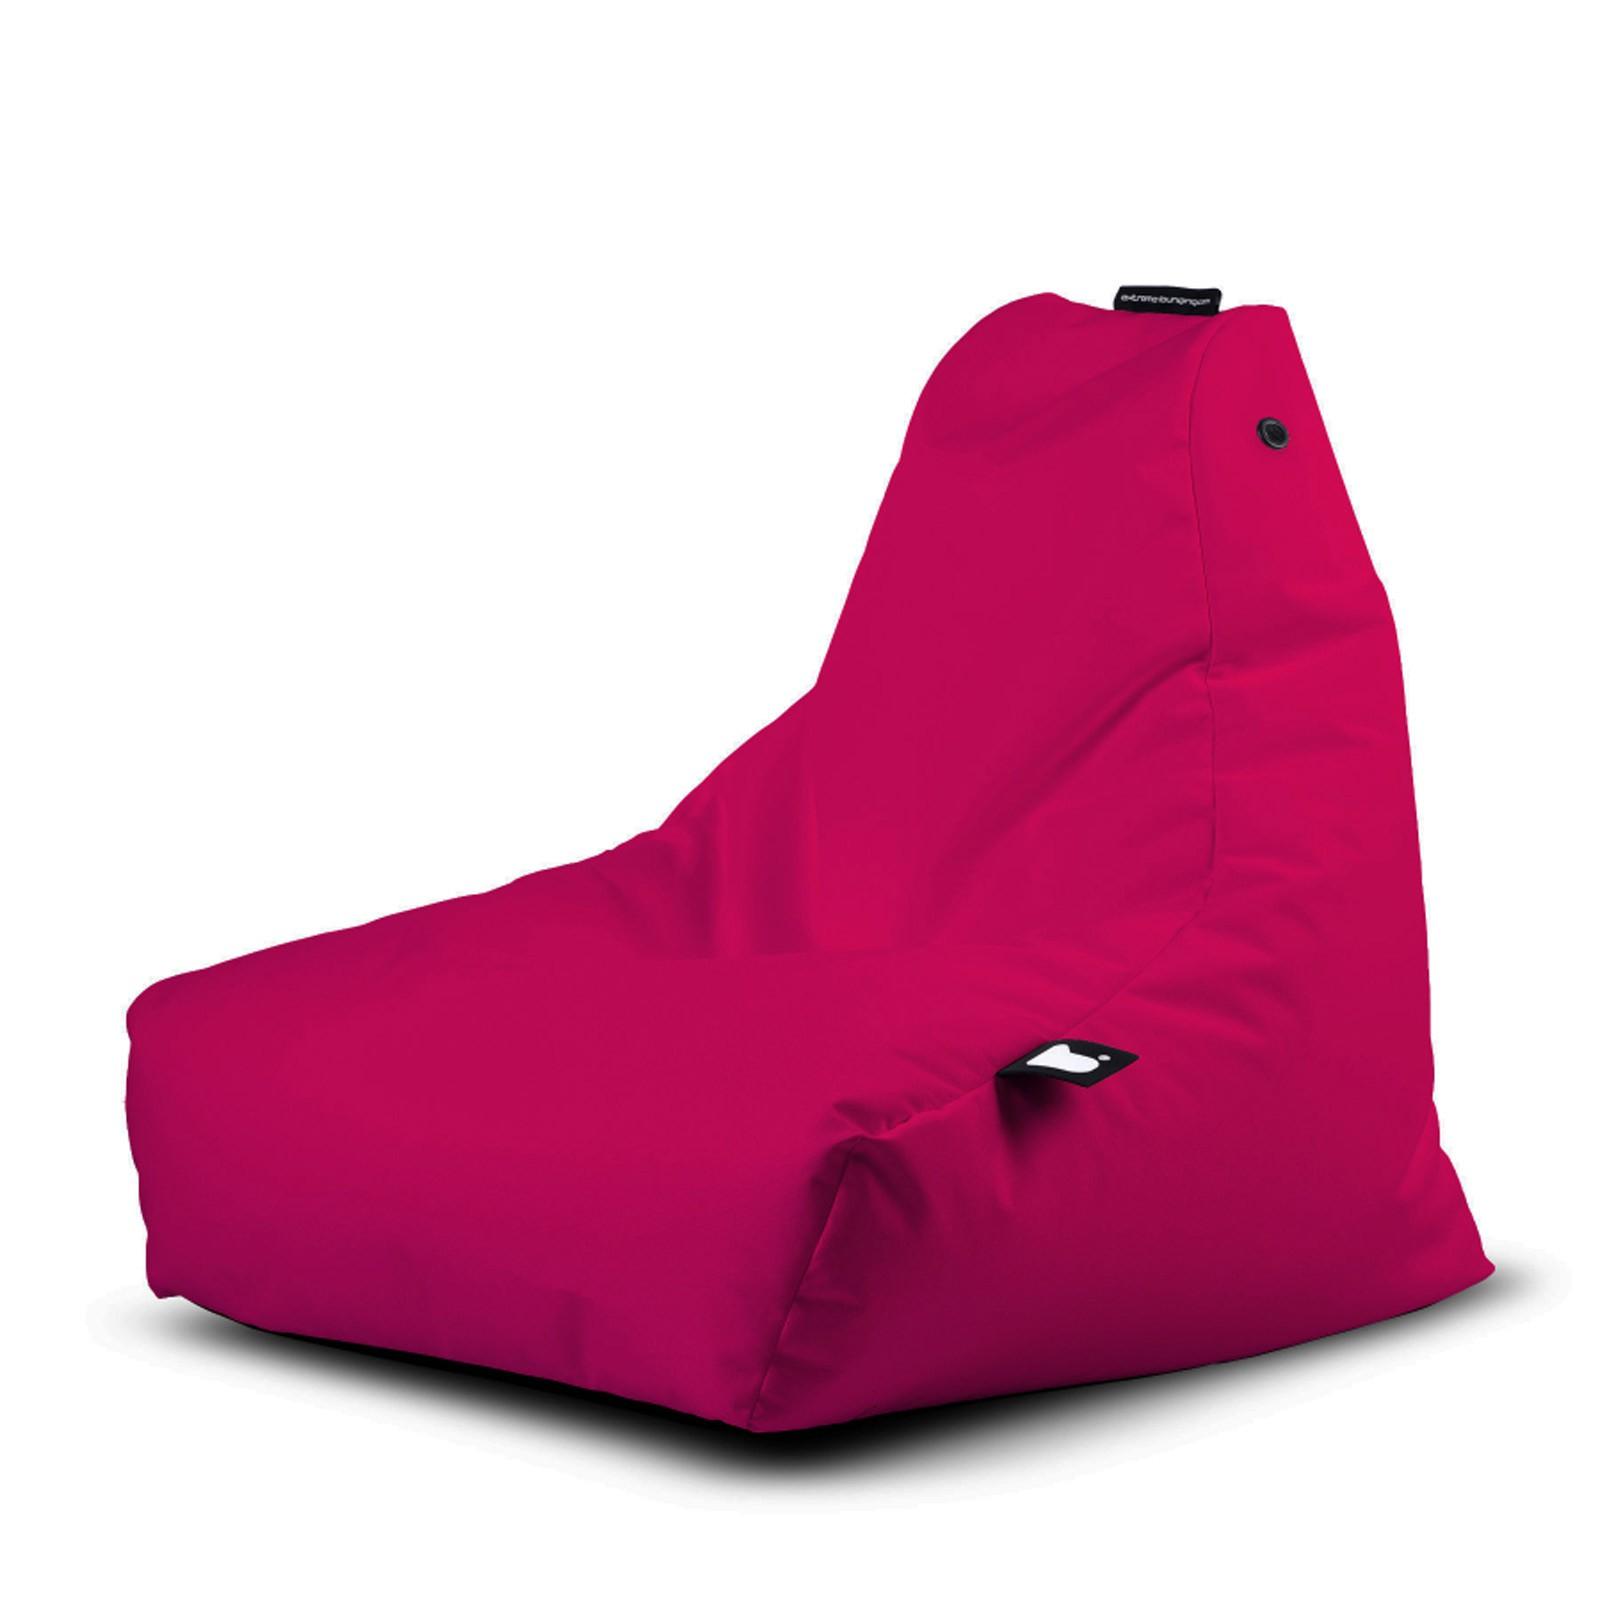 b-bag Extreme Lounging Mini Sitzsack Indoor-/Outdoor mini-b Farbe Pink